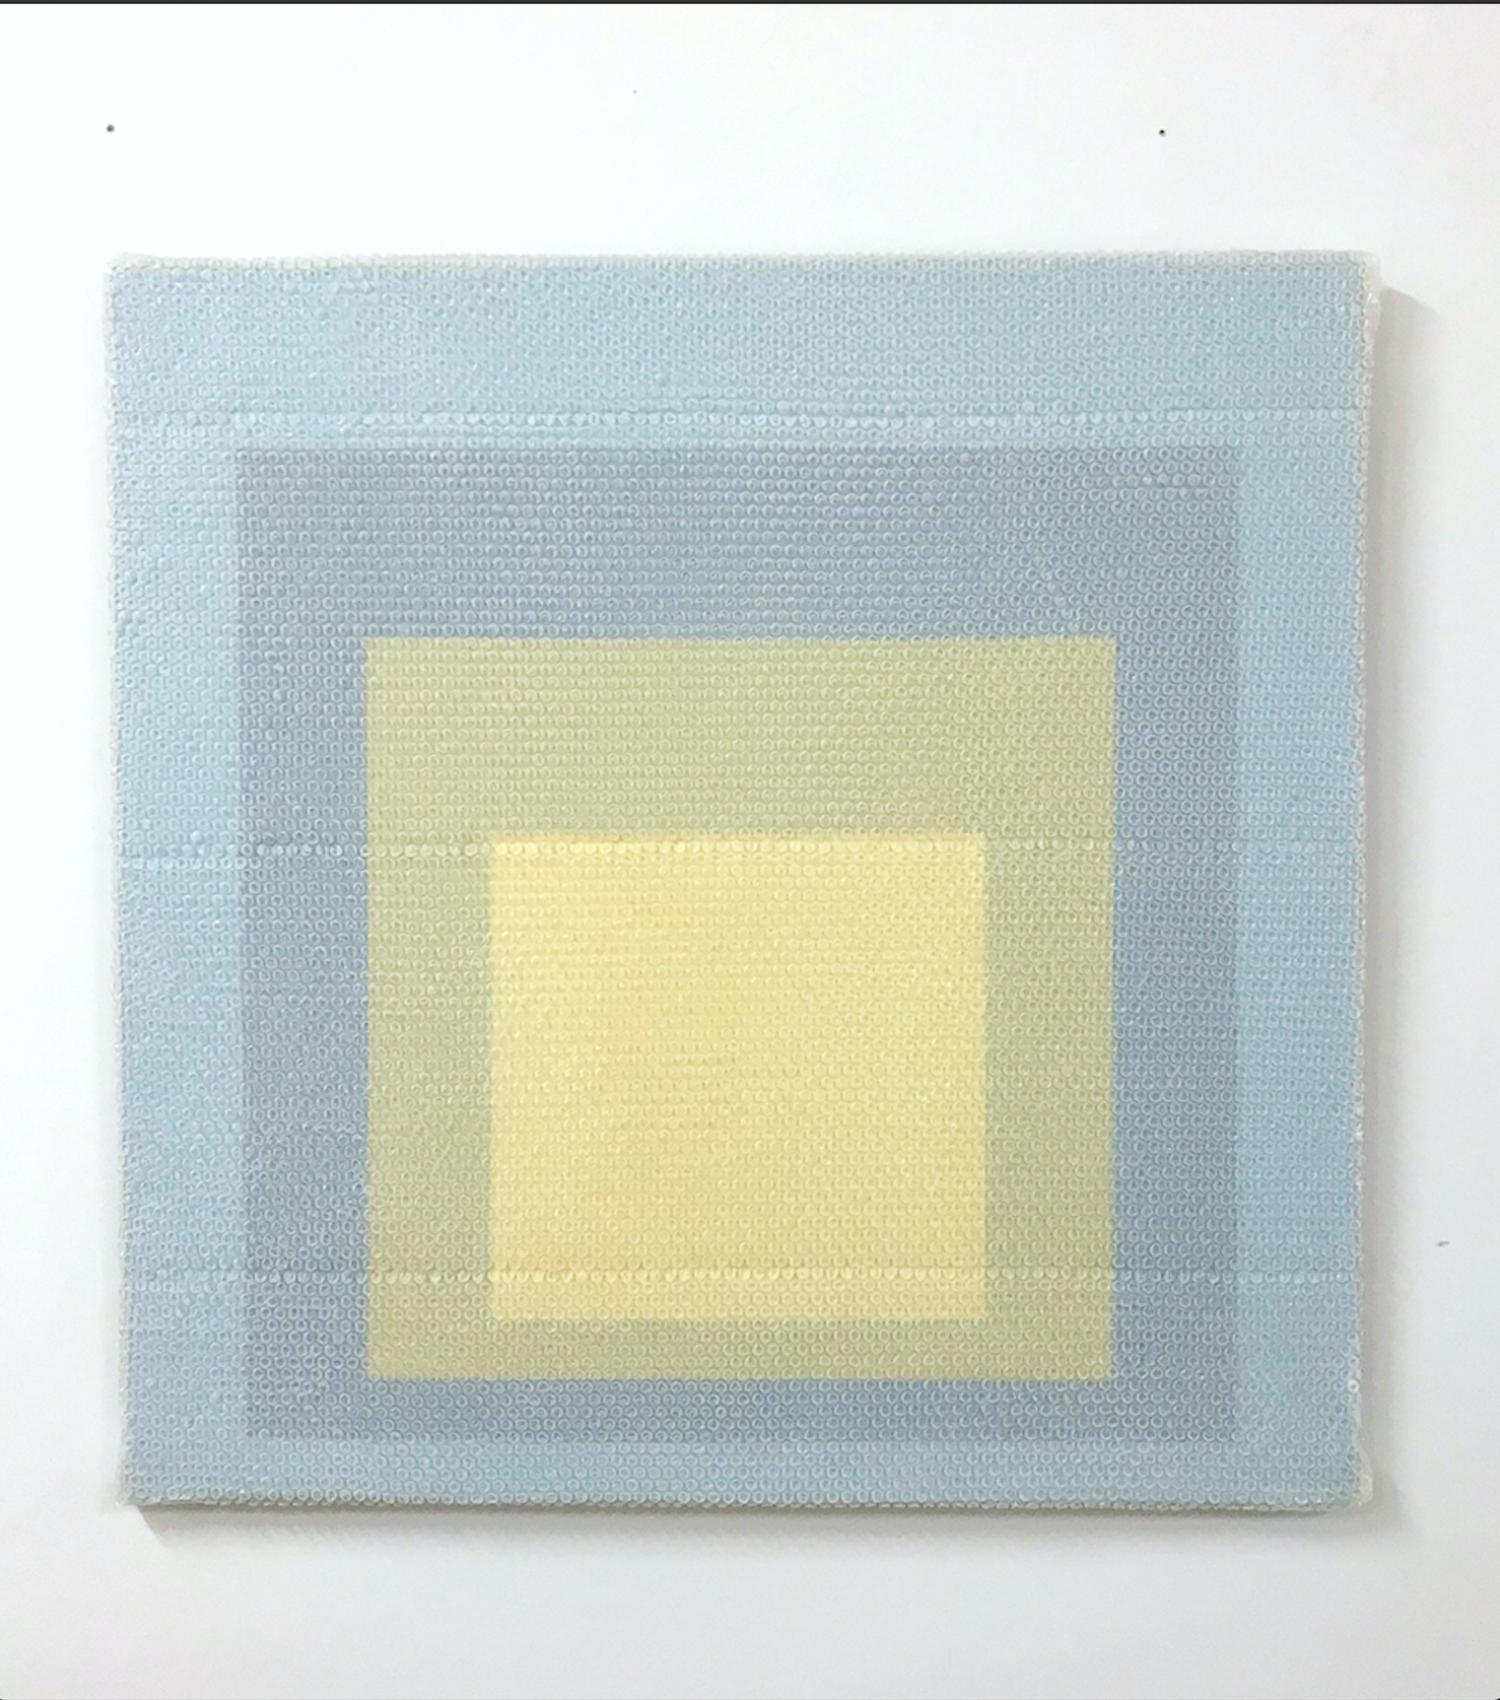 "Homage to the square #3,  2018,  Acrylique sur toile     36"" X 36""."